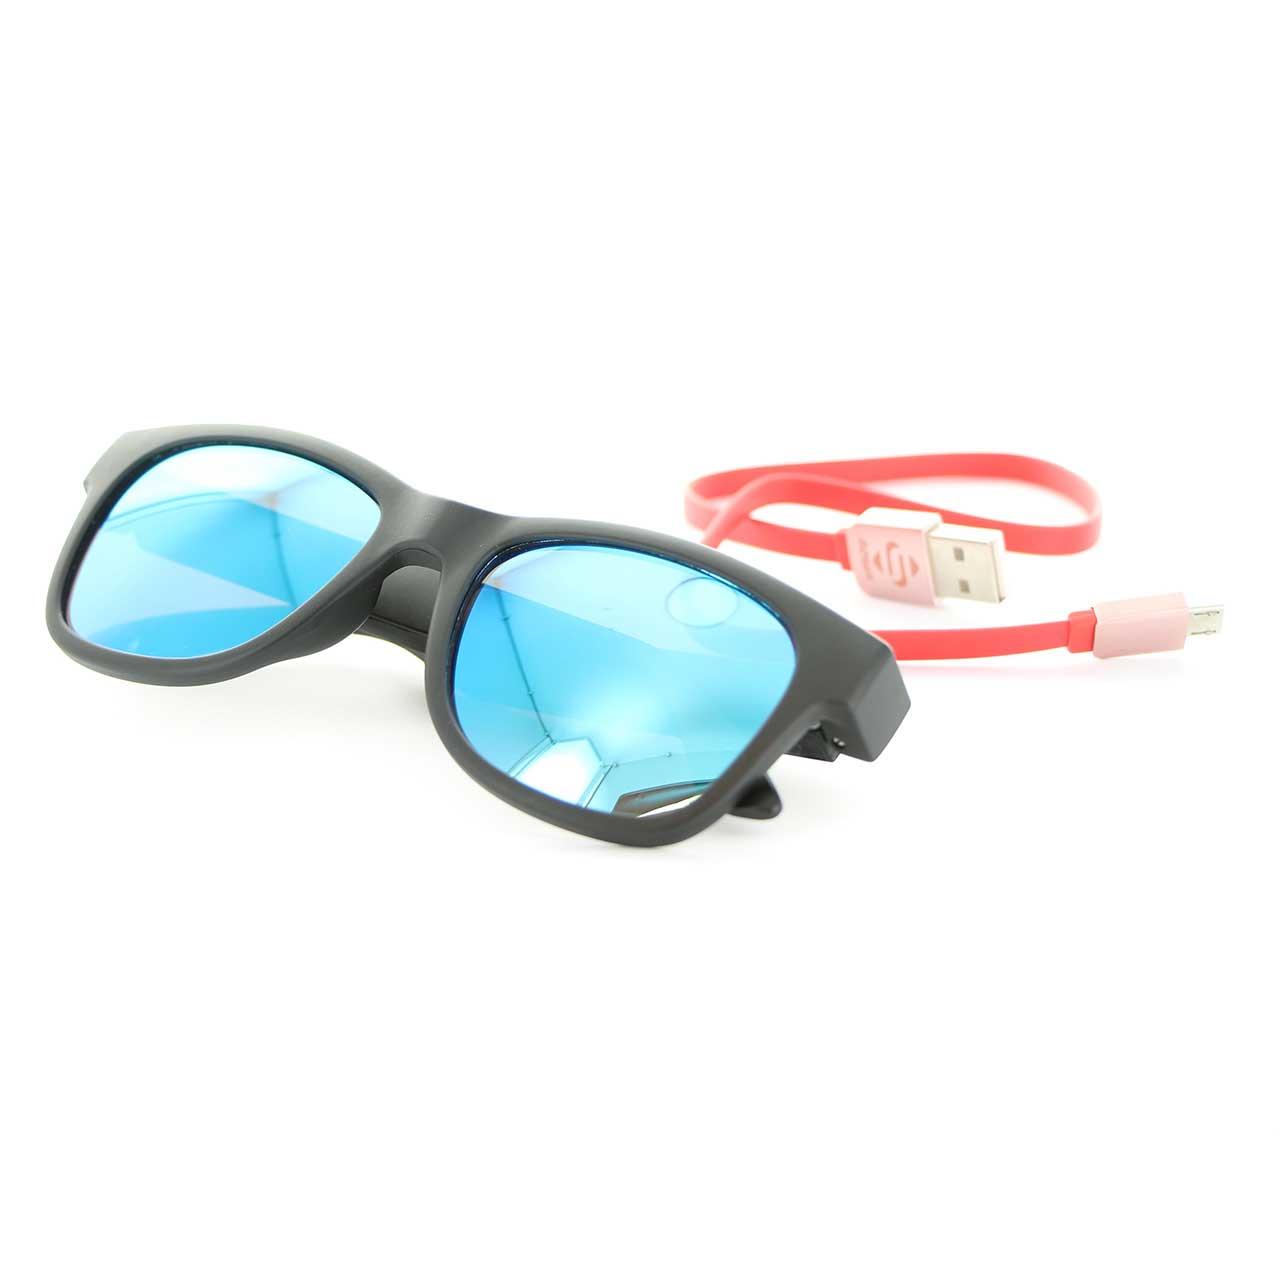 Branded Bluetooth Sunglasses